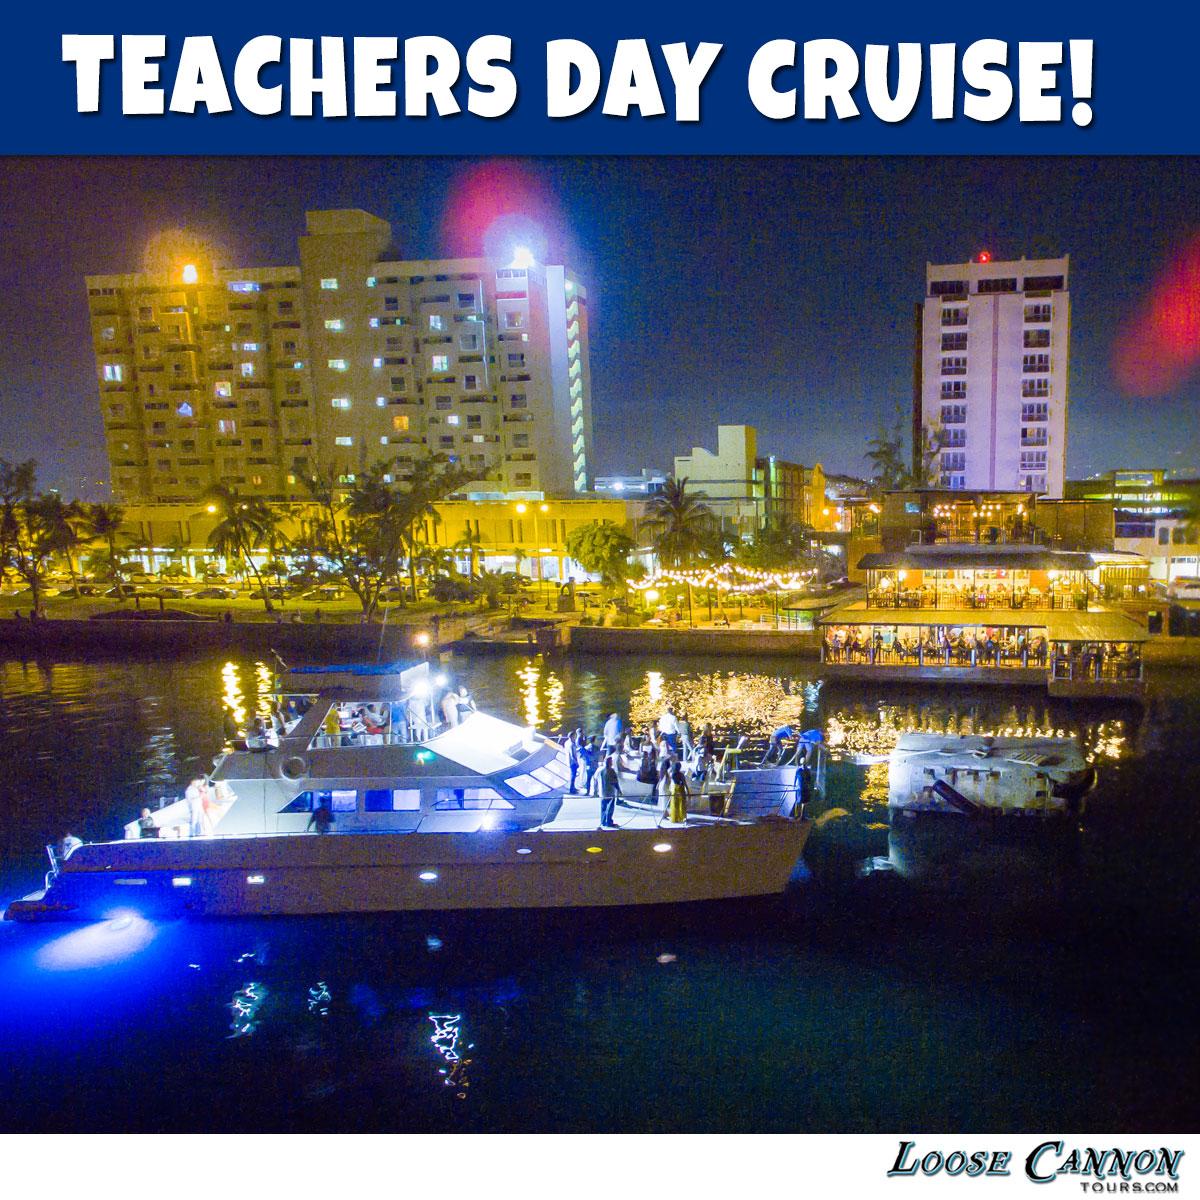 Teachers Day Celebration Evening Cruise - Wednesday, May 8th